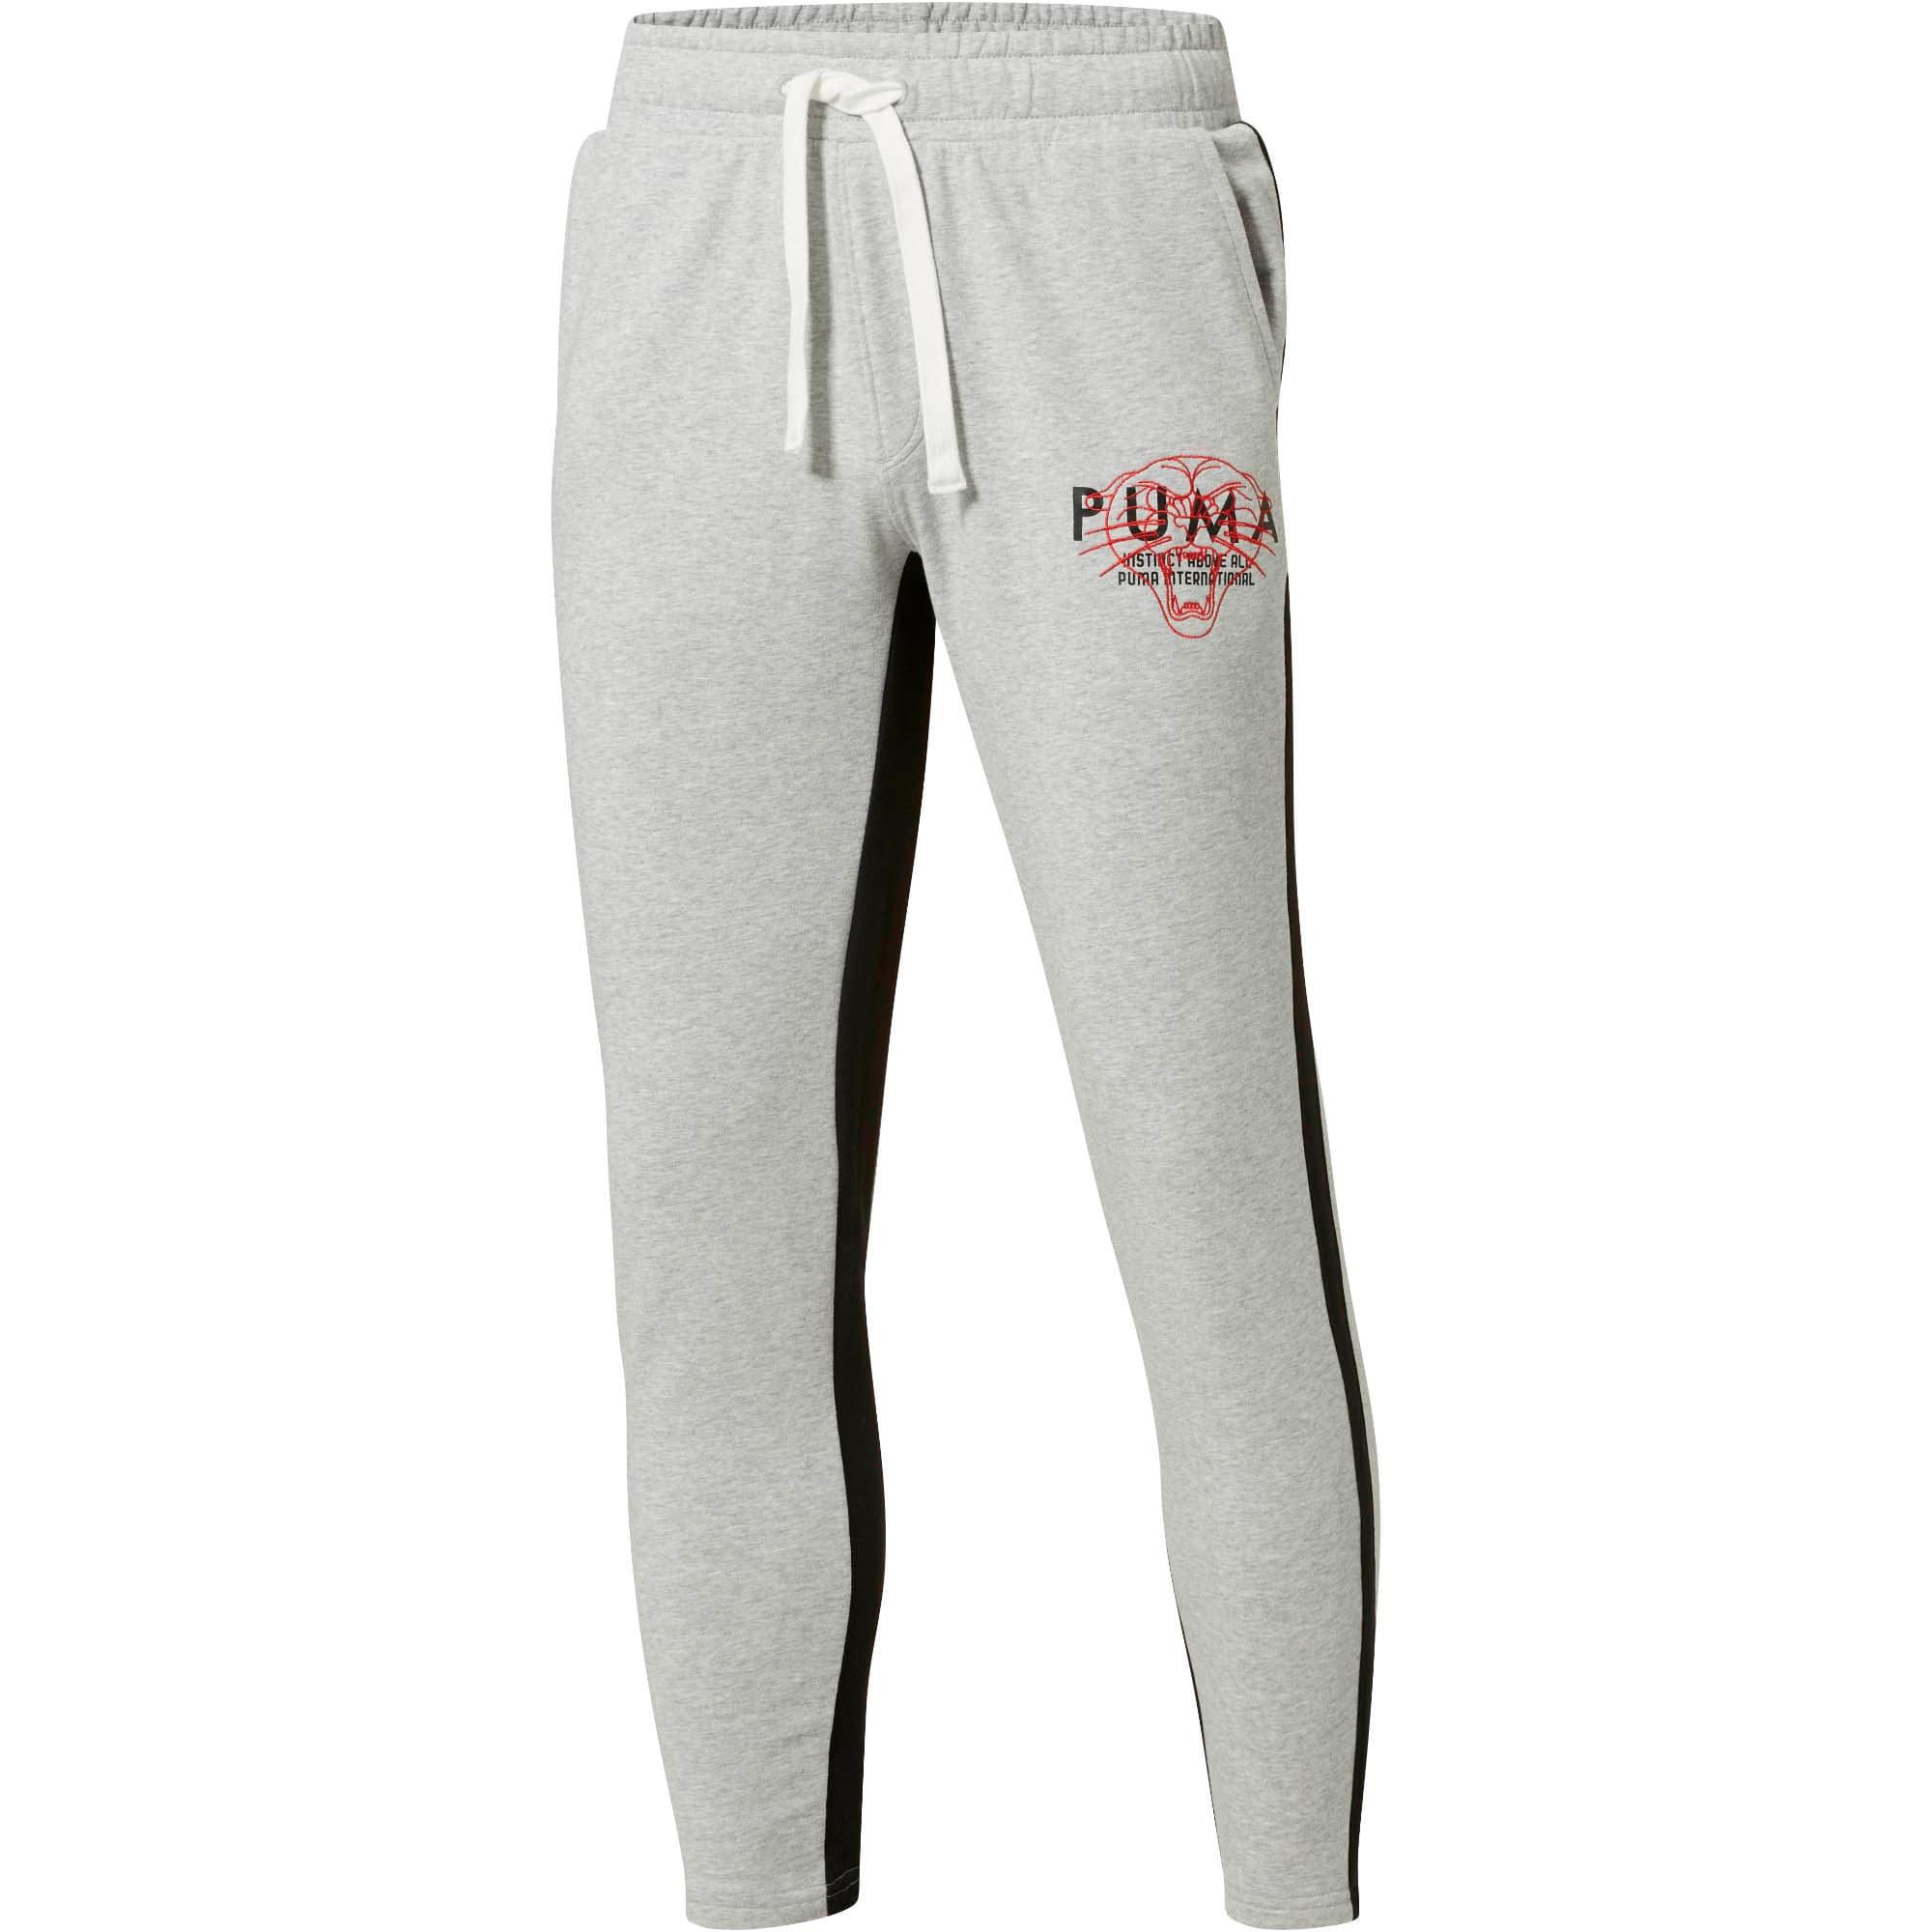 Thumbnail 2 of Last Dayz Men's Sweatpants, LGH-Puma Black, medium